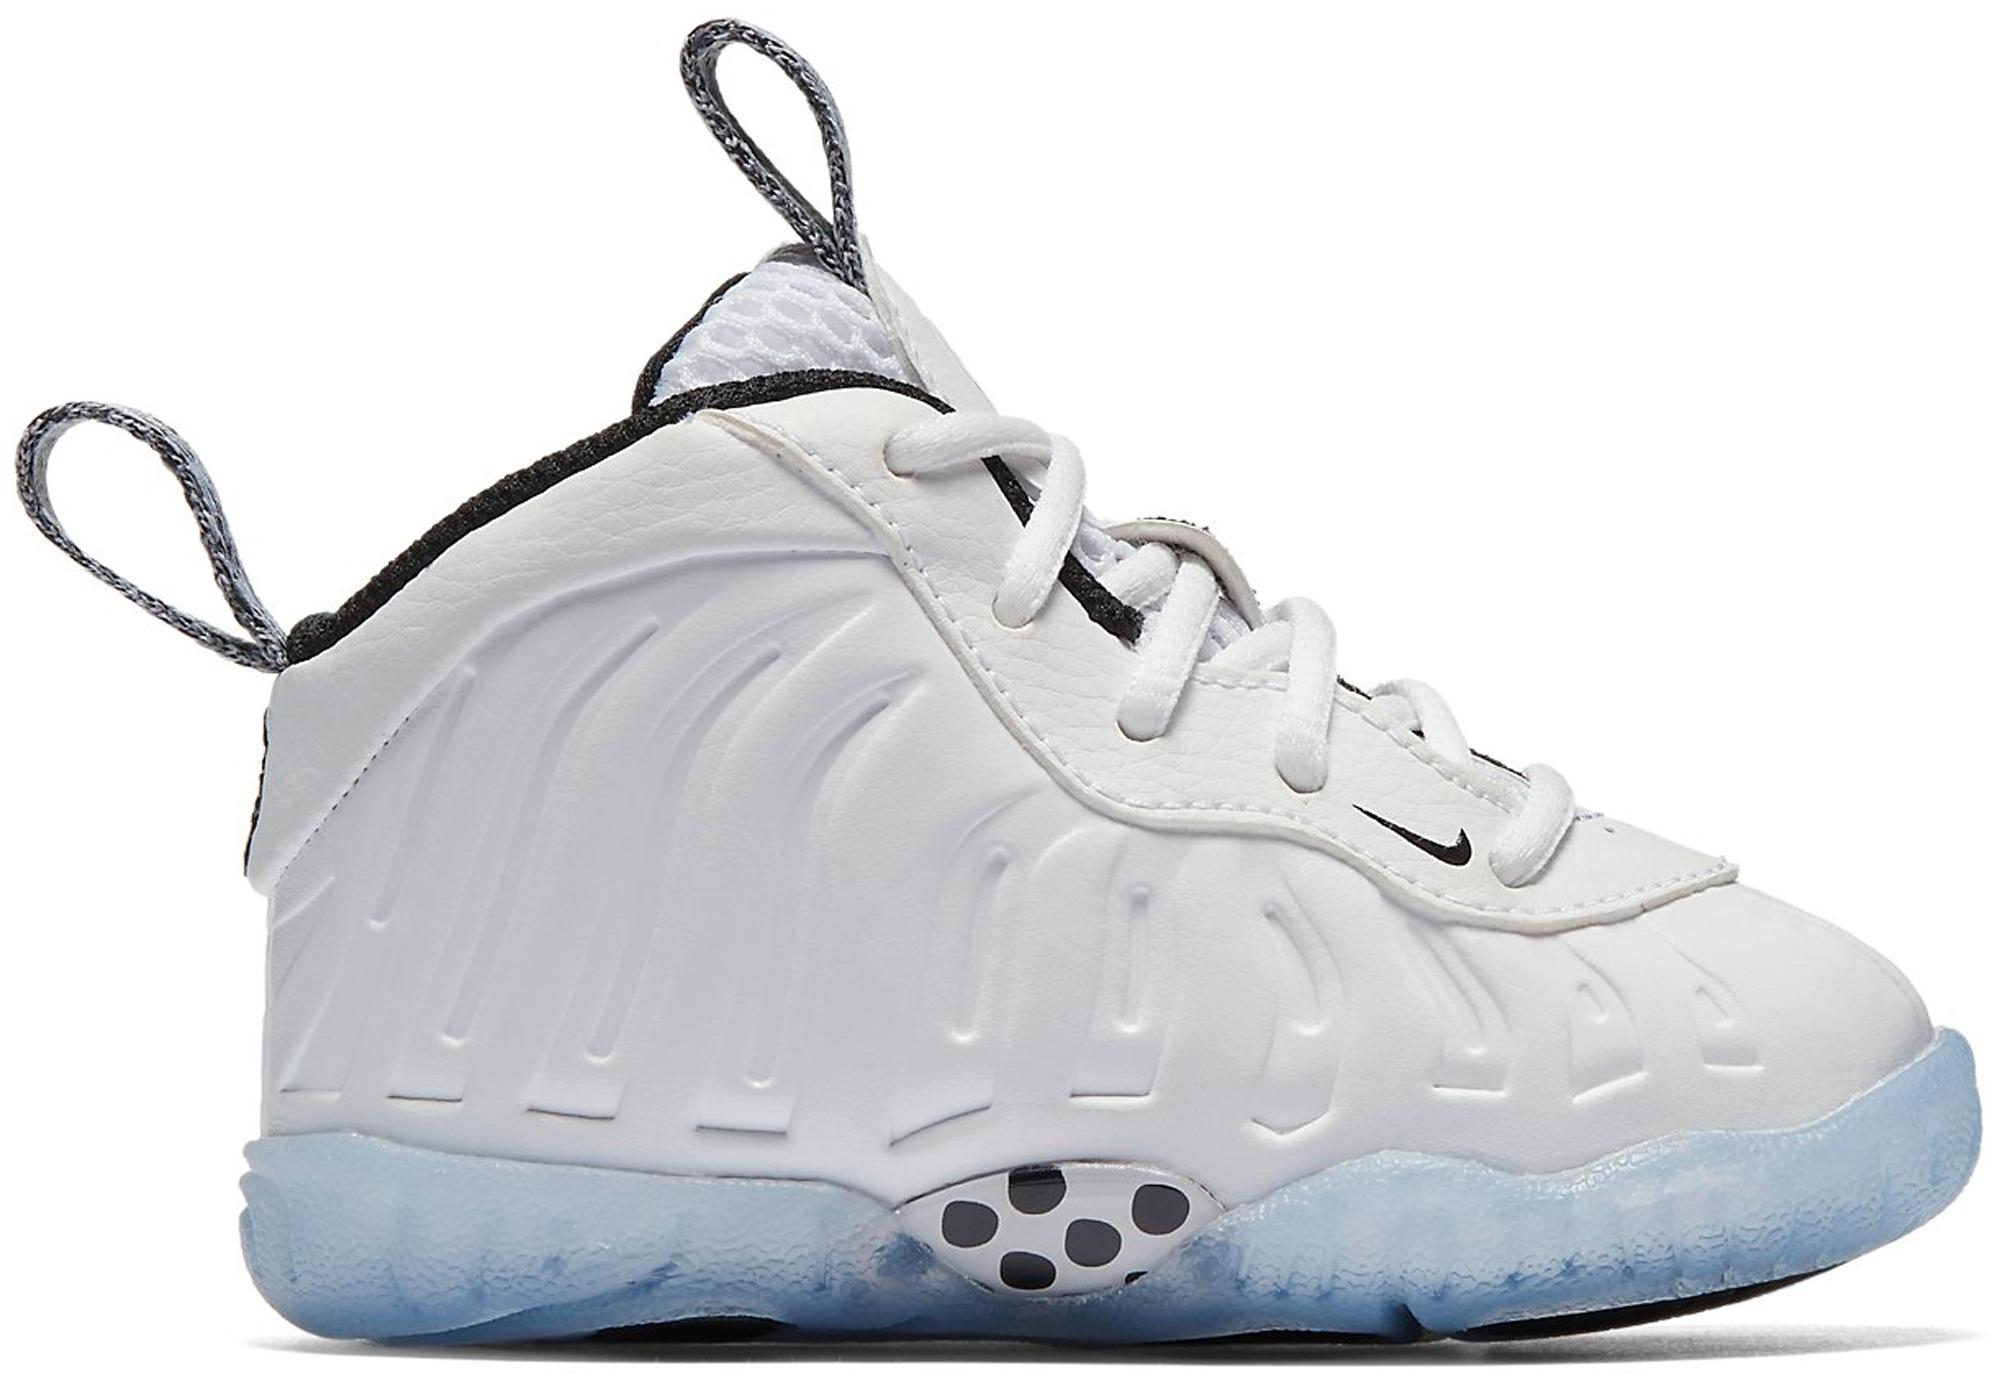 Nike Air Foamposite One White Ice (TD